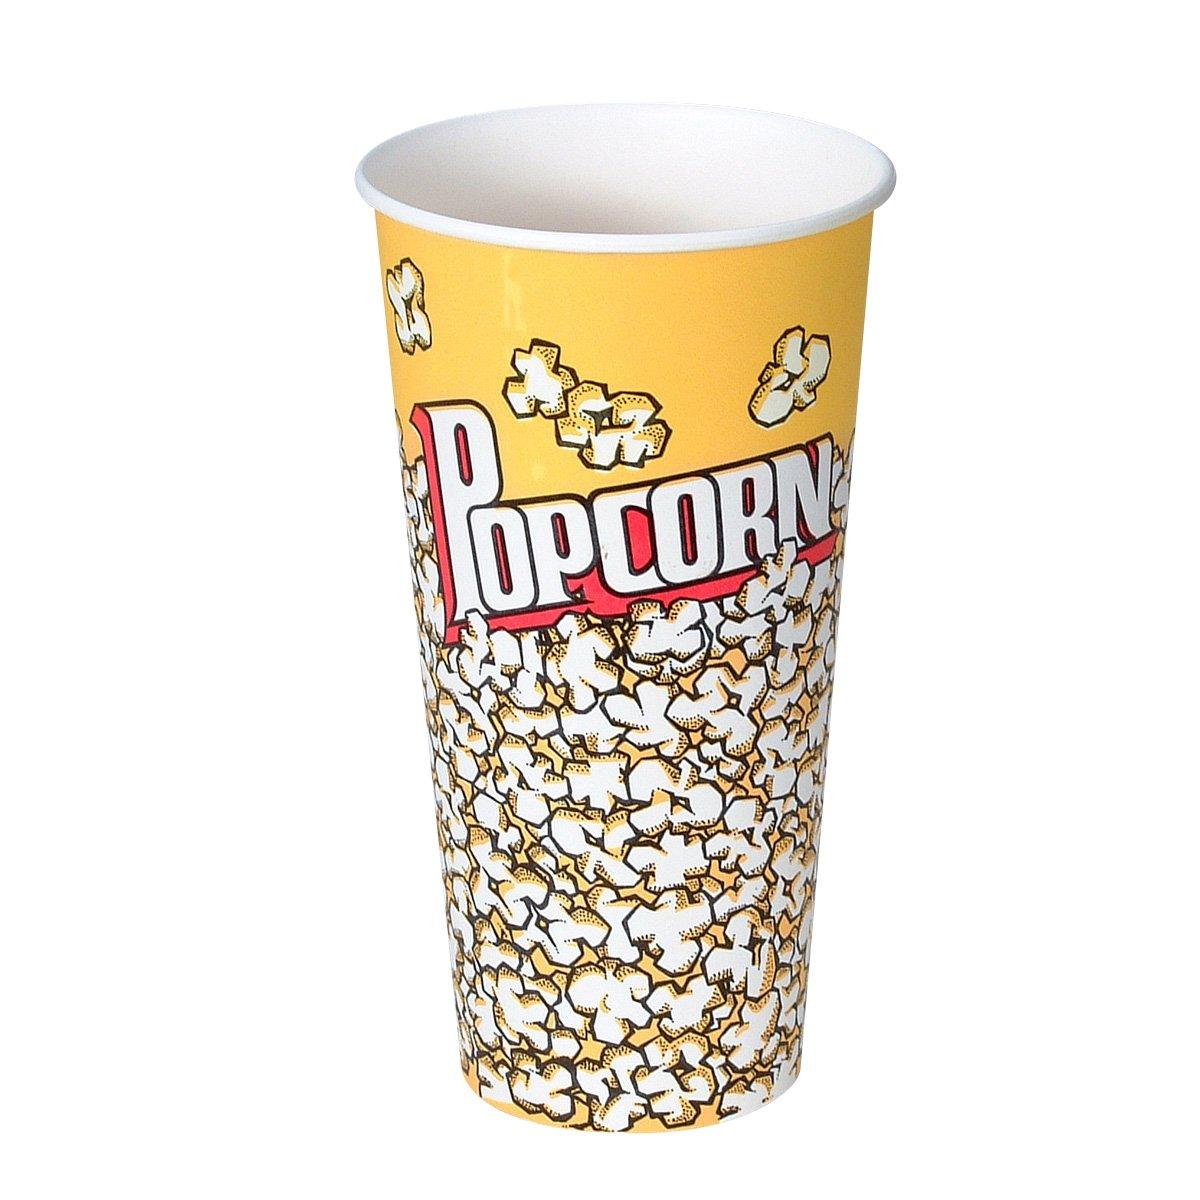 SOLO V24-00061 Treated Paper Popcorn Cup, 24 oz. Capacity, Popcorn Print (Case of 1,000)